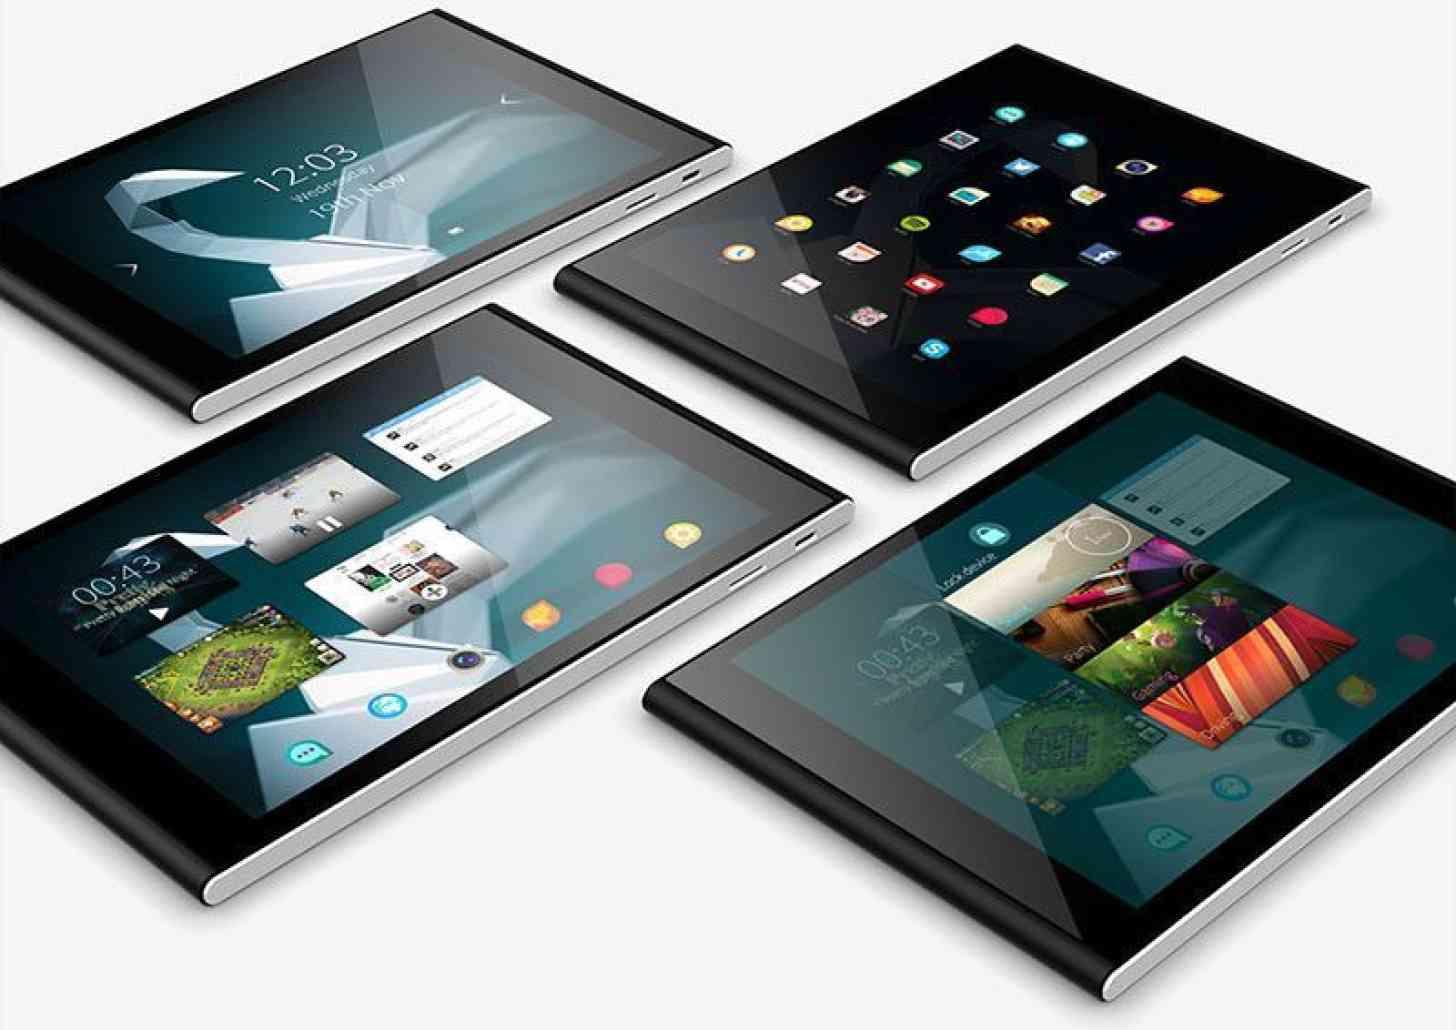 Jolla Tablet screens